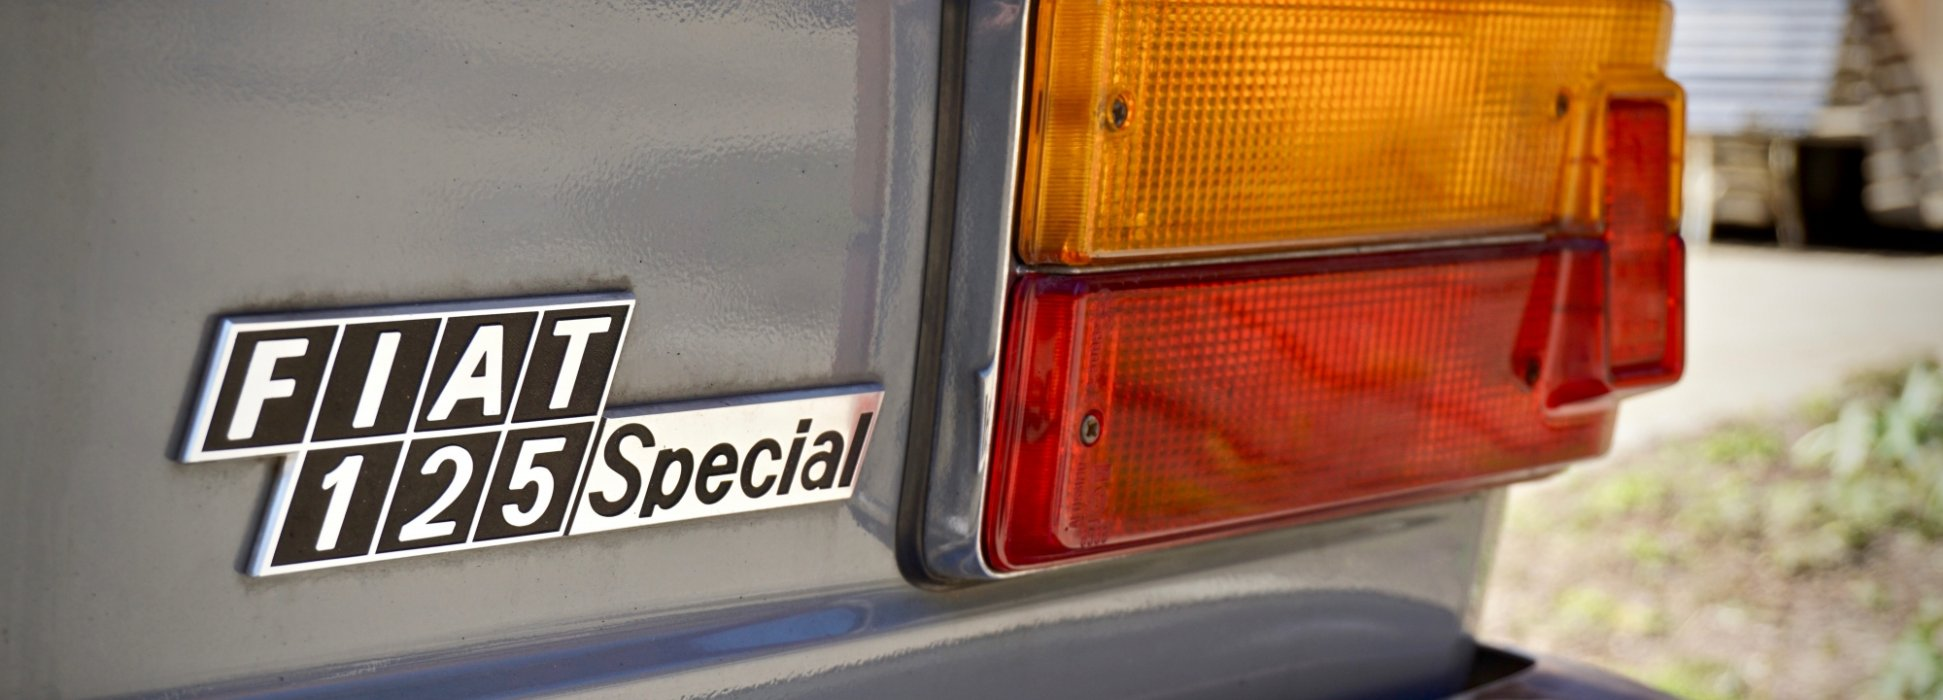 Fiat 125 Special Sportlimousine 1